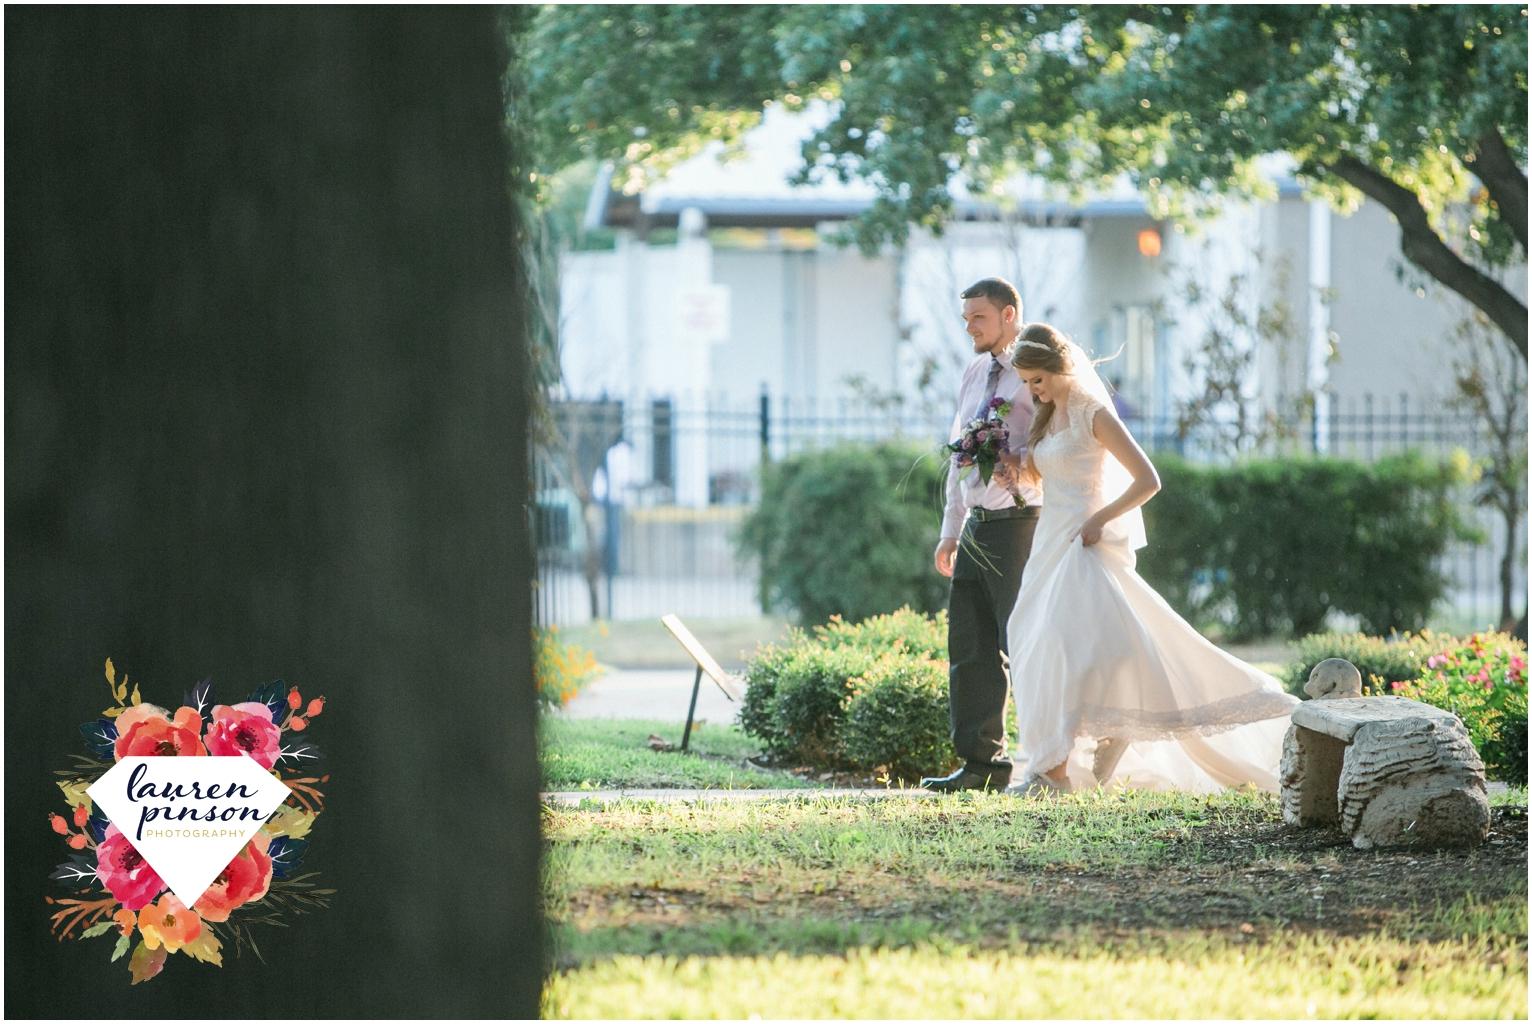 wichita-falls-wedding-photography-at-fain-presbyterian-church-and-the-wellington-timeless-classic-modern-photographer_1253.jpg